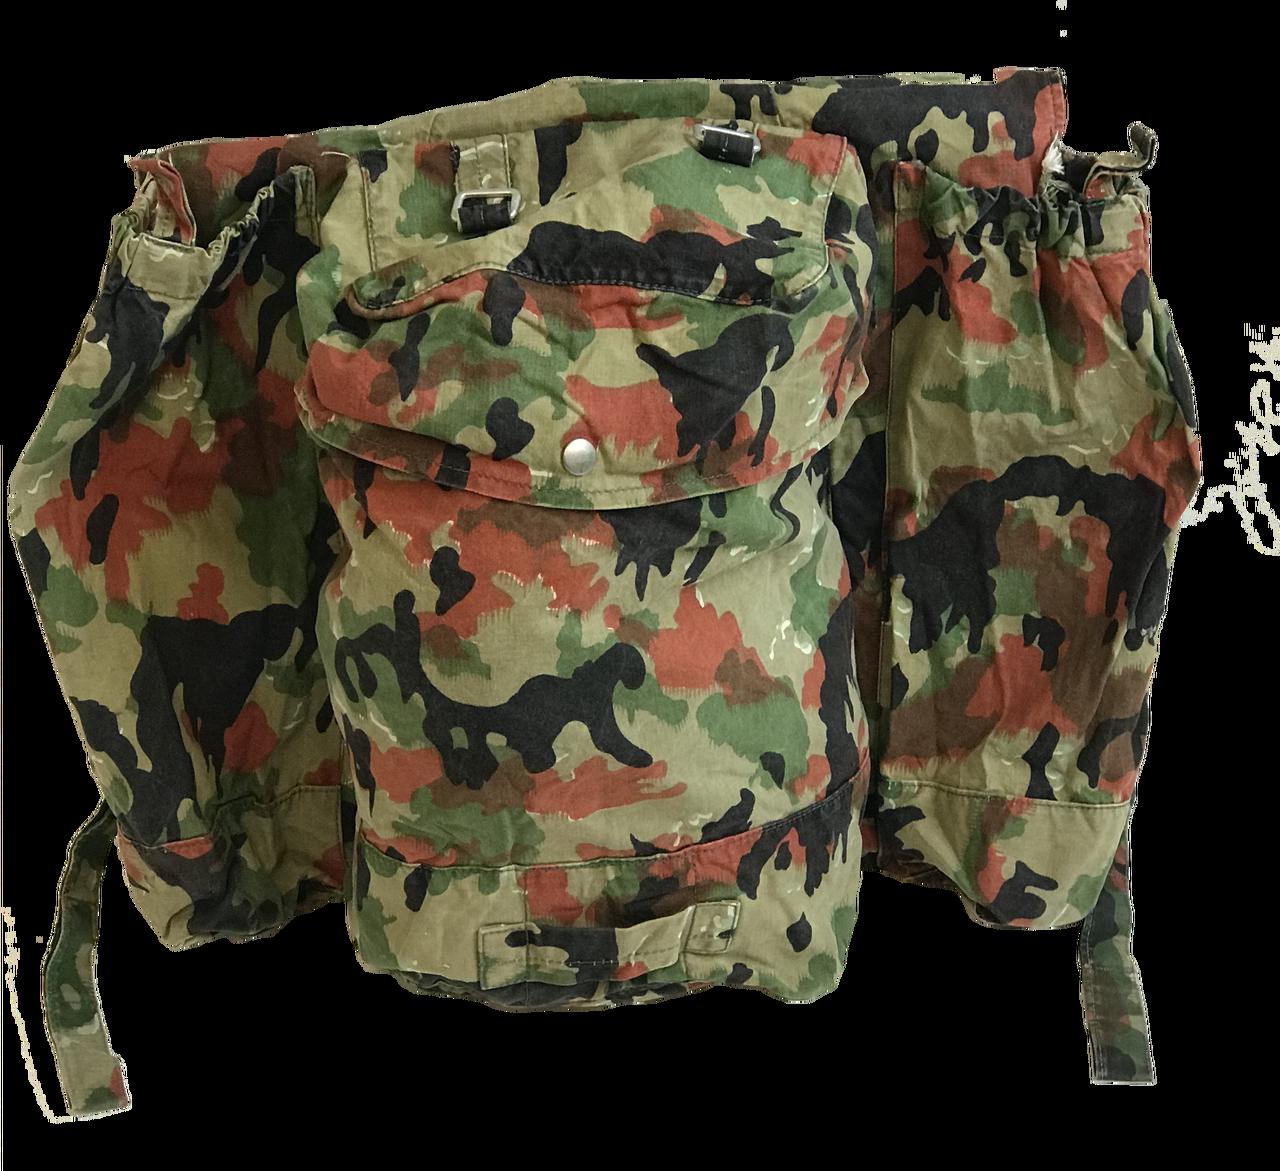 b8c81641597e2 Swiss M70 Rucksack Alepenflage Camo - Army Surplus Warehouse